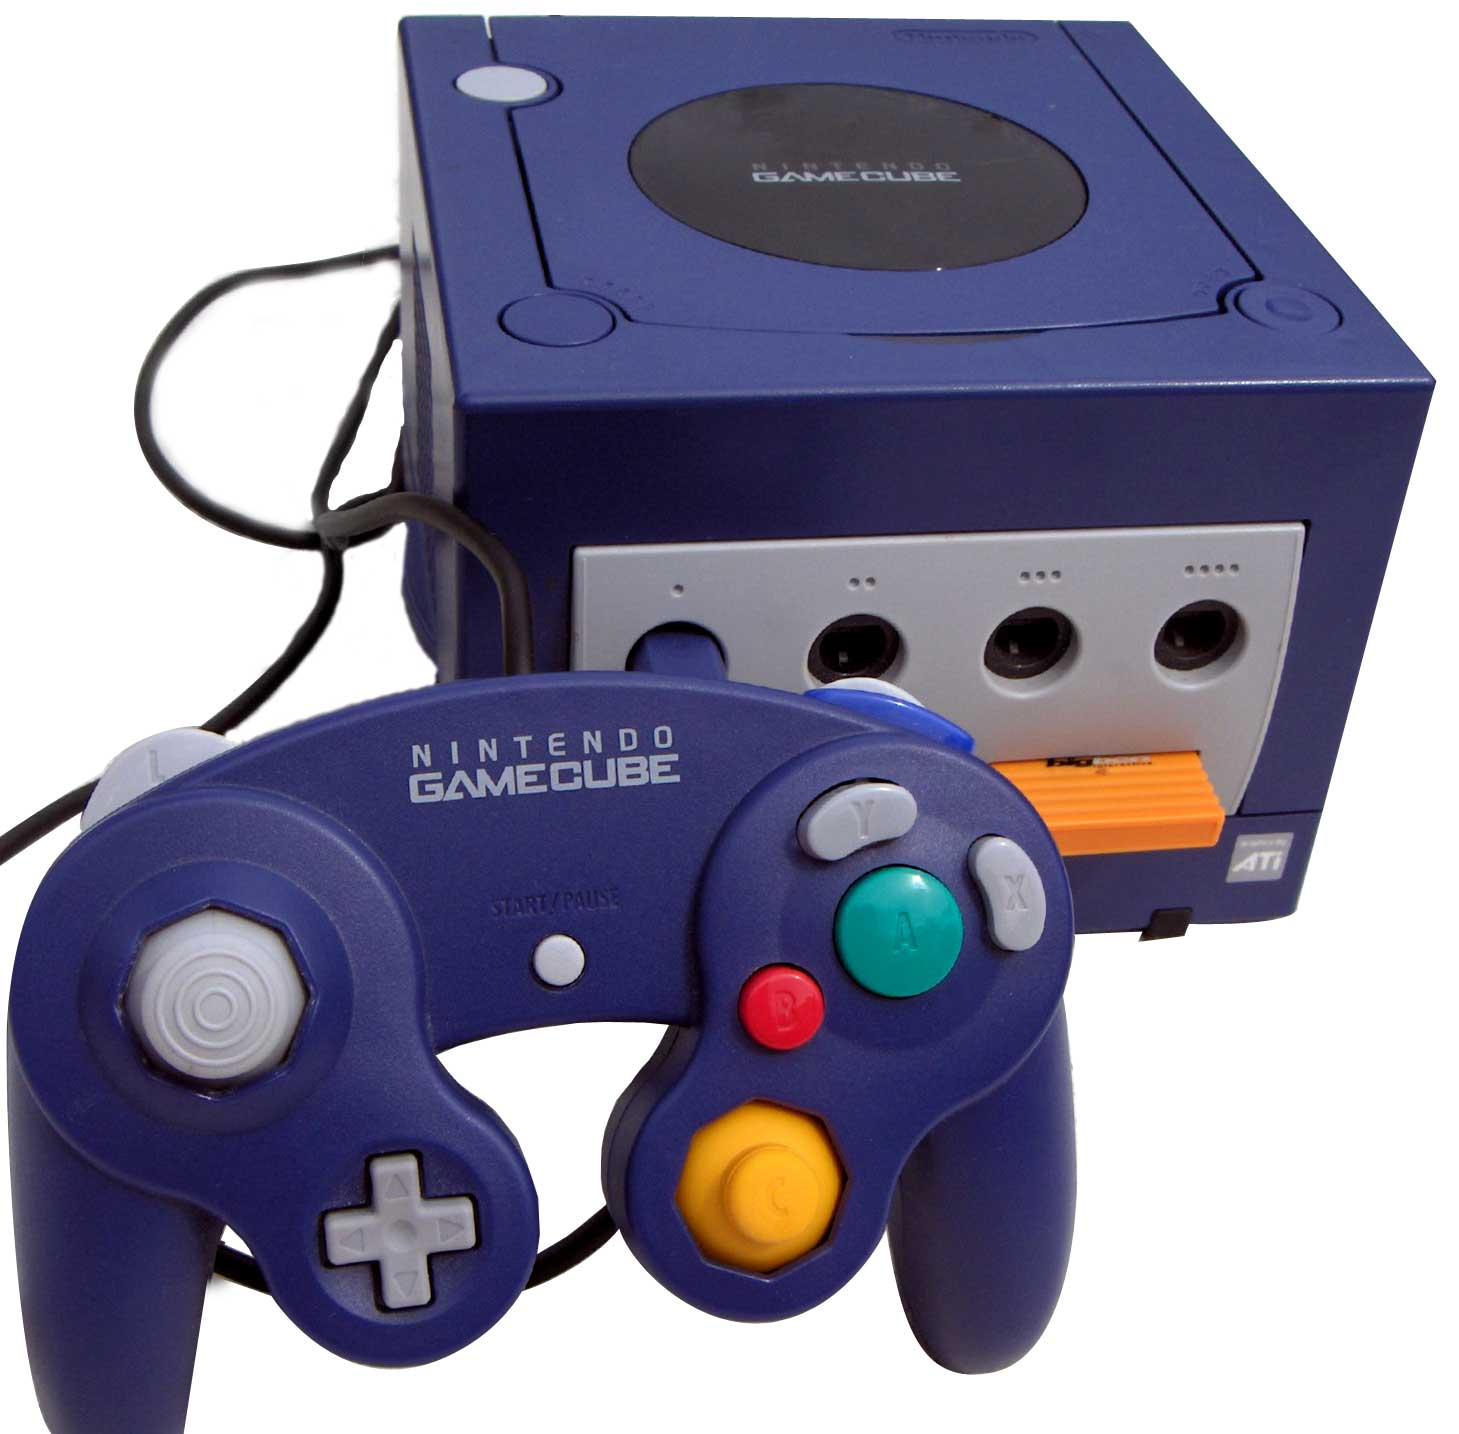 Imagen: Videoconsola Nintendo GameCube de 2002, autor de la imgen: Guillaume Bokiau (cc:by-sa)